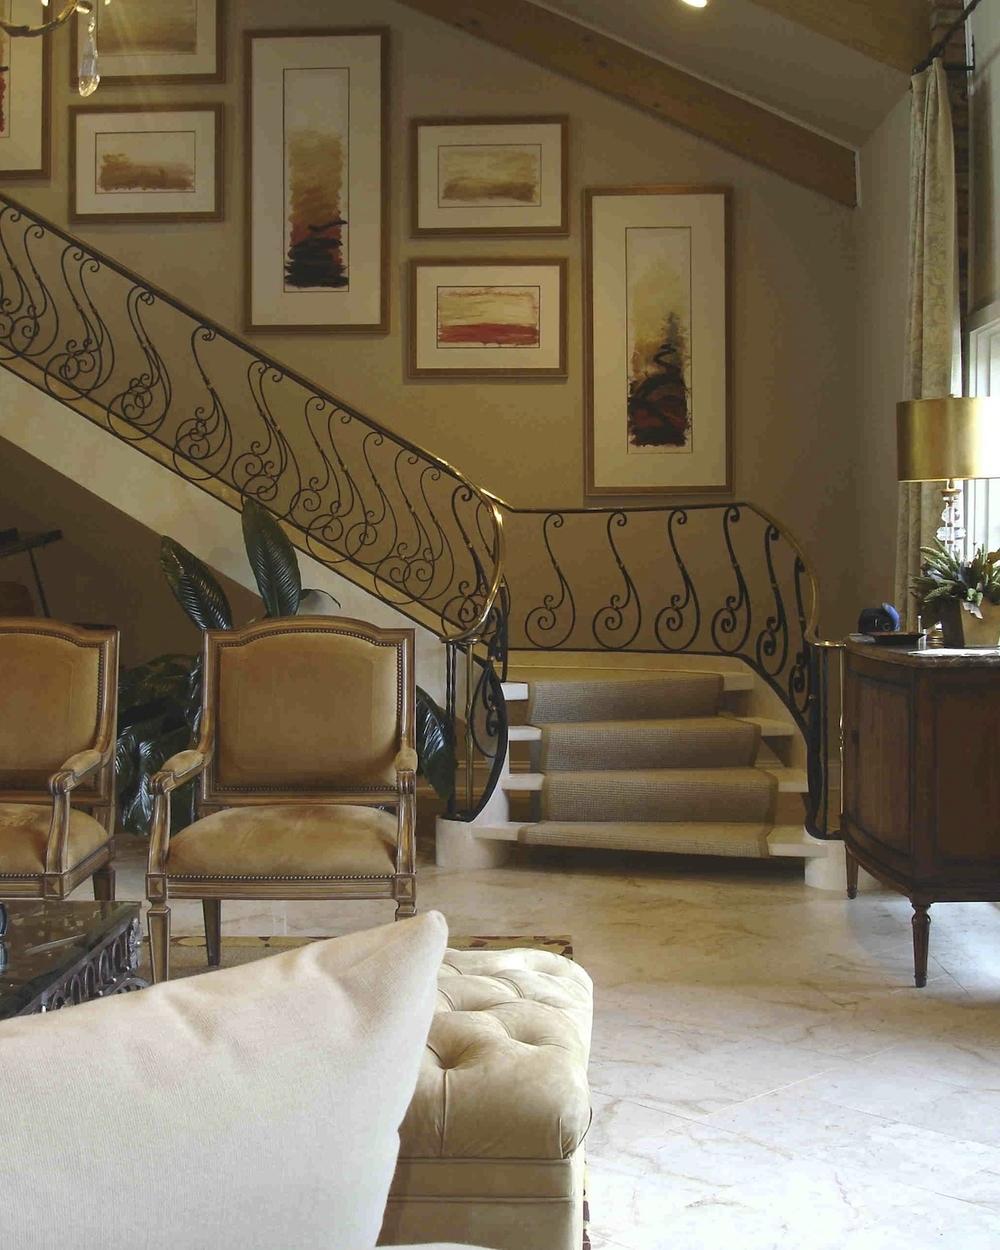 c-house-stair.jpg